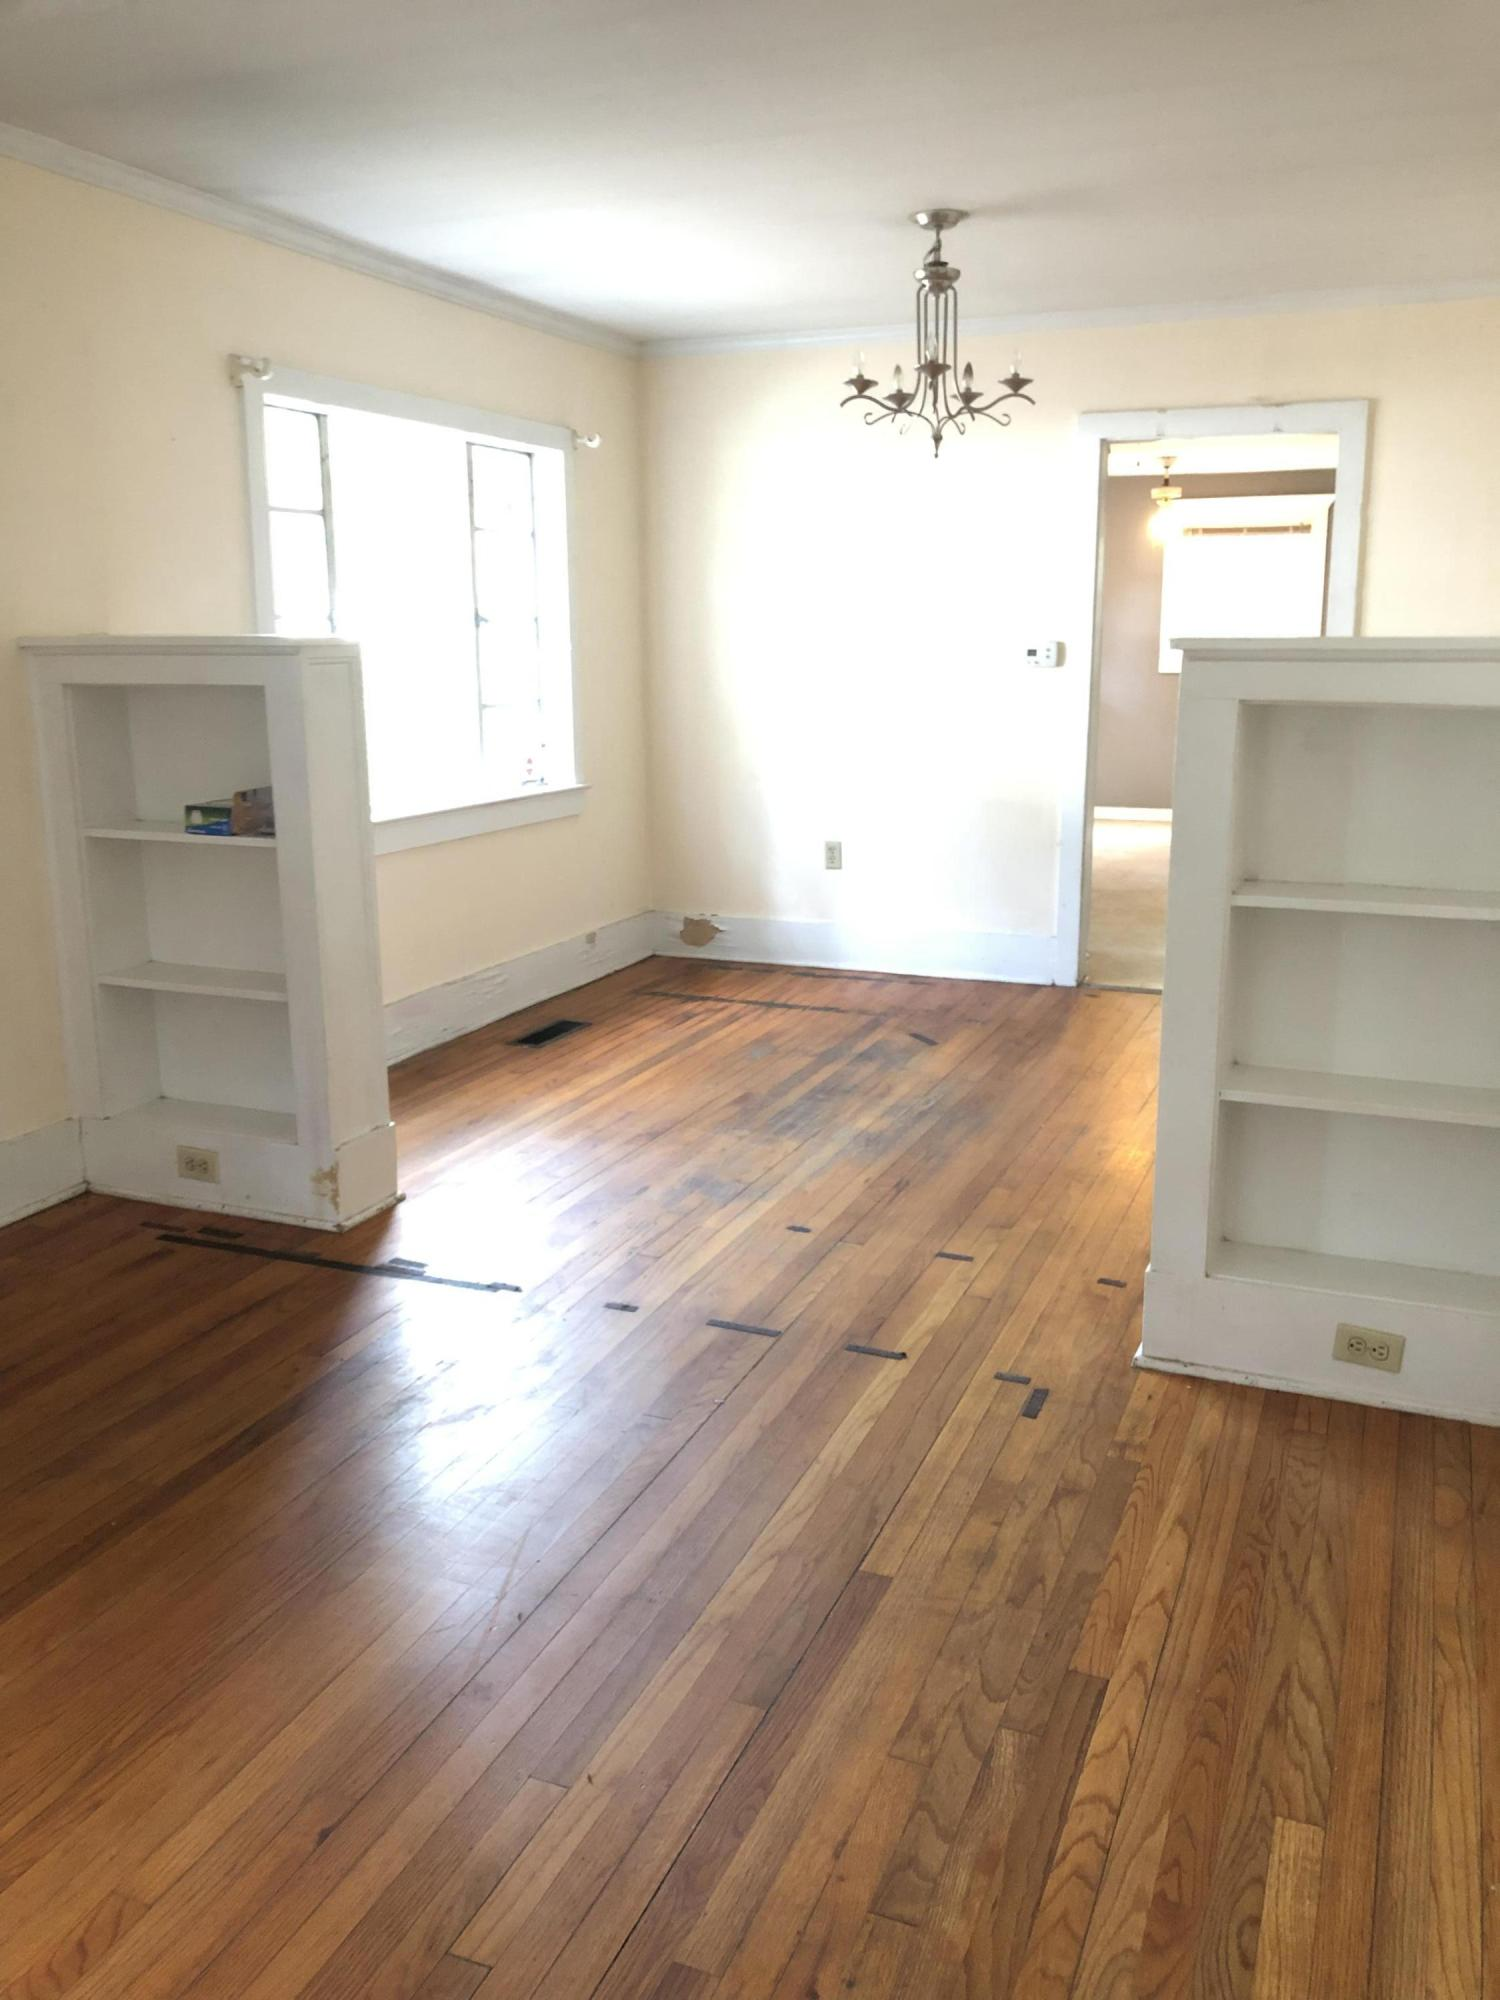 Old Mt Pleasant Homes For Sale - 733 Adluh, Mount Pleasant, SC - 6